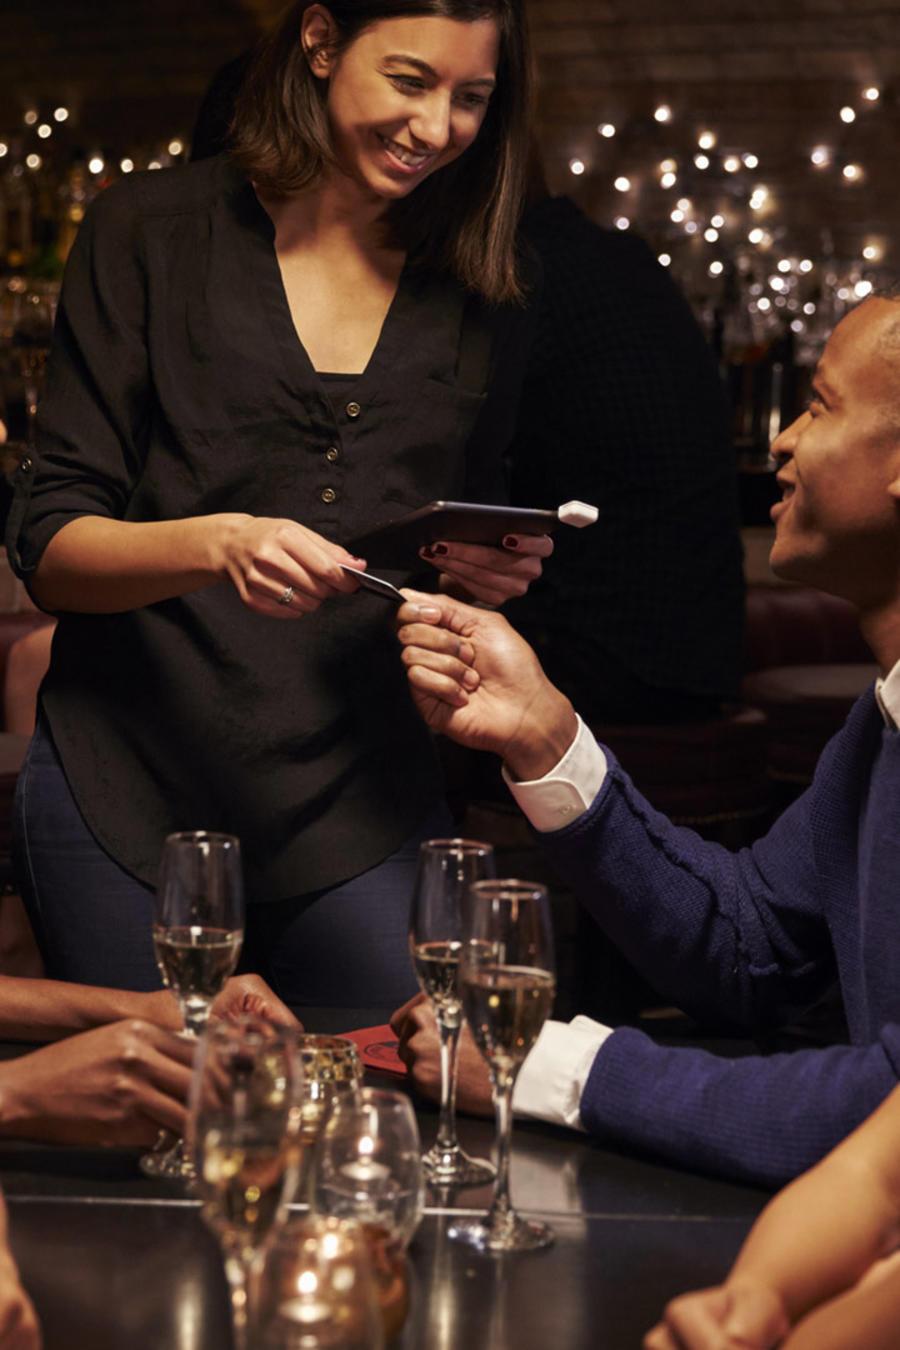 Camarera tomando un pago a un grupo de amigos, en un restaurant